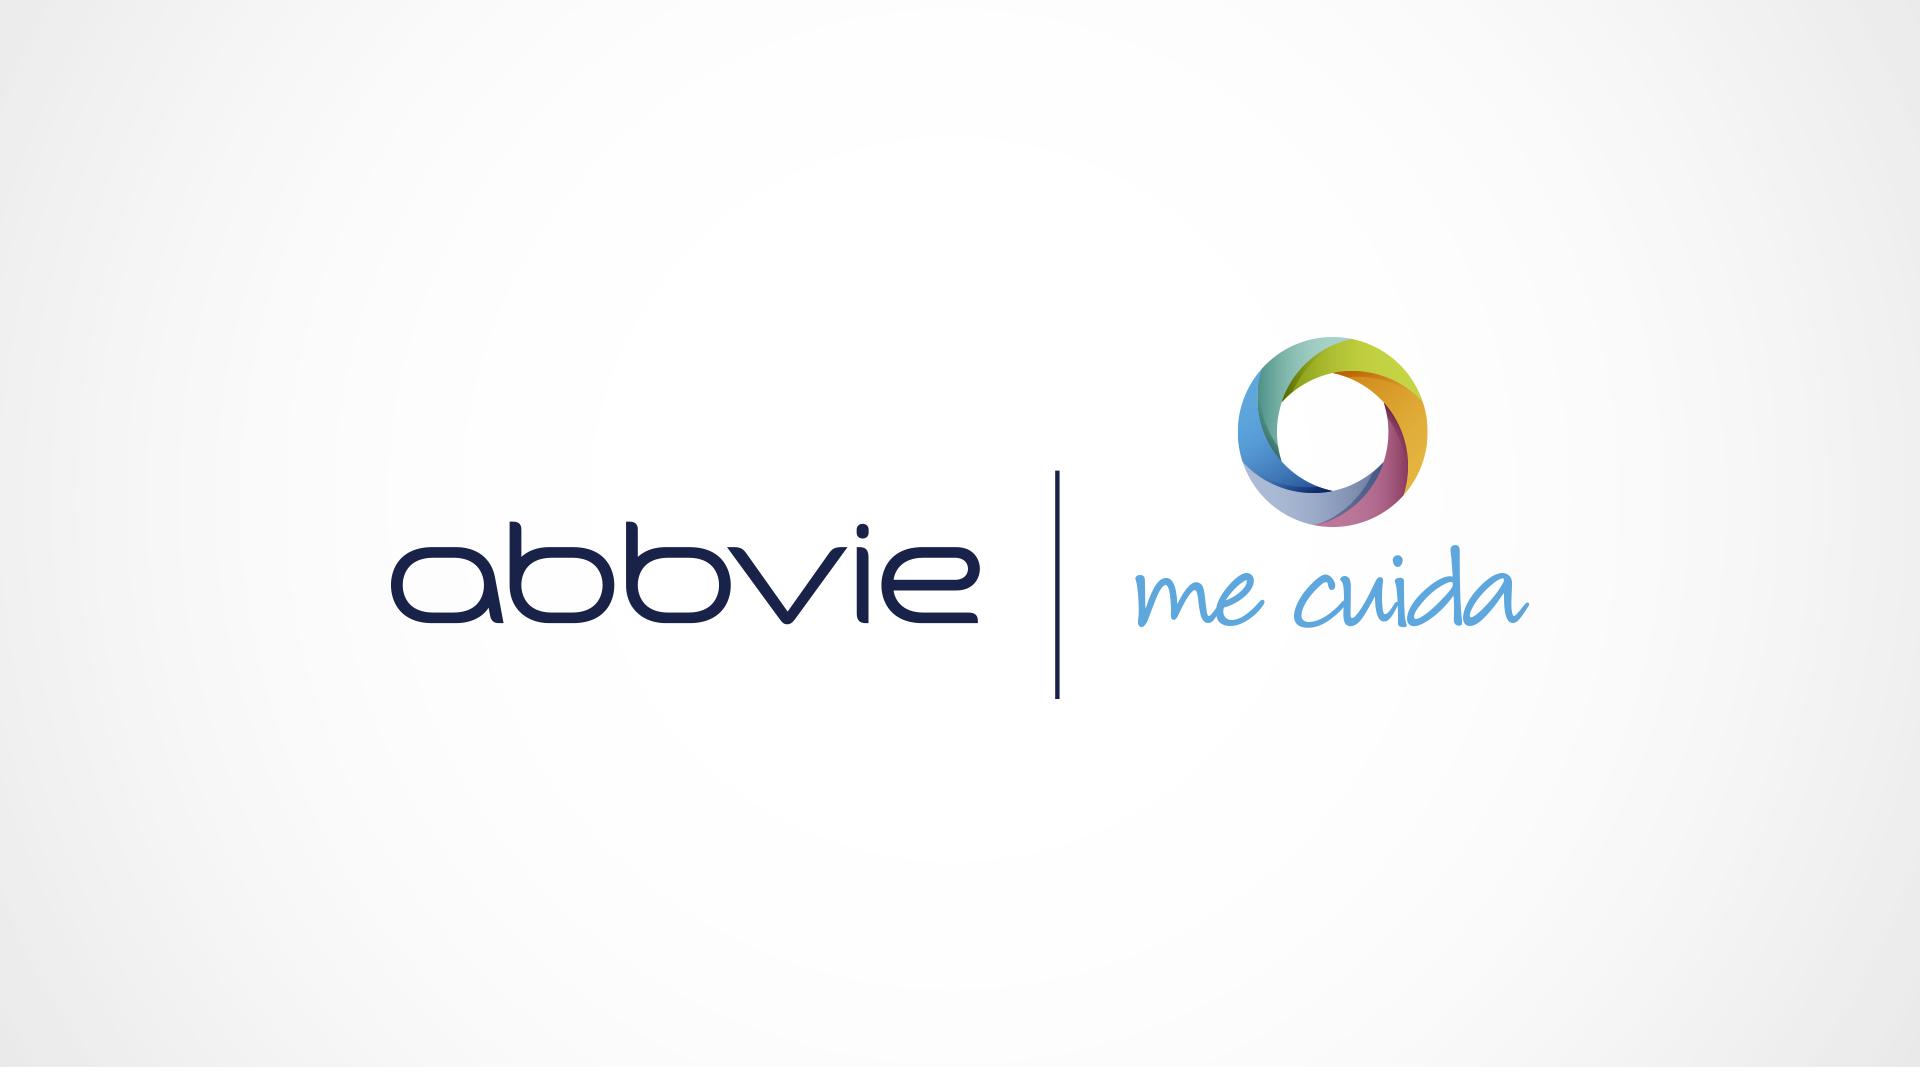 Abbvie Me Cuida